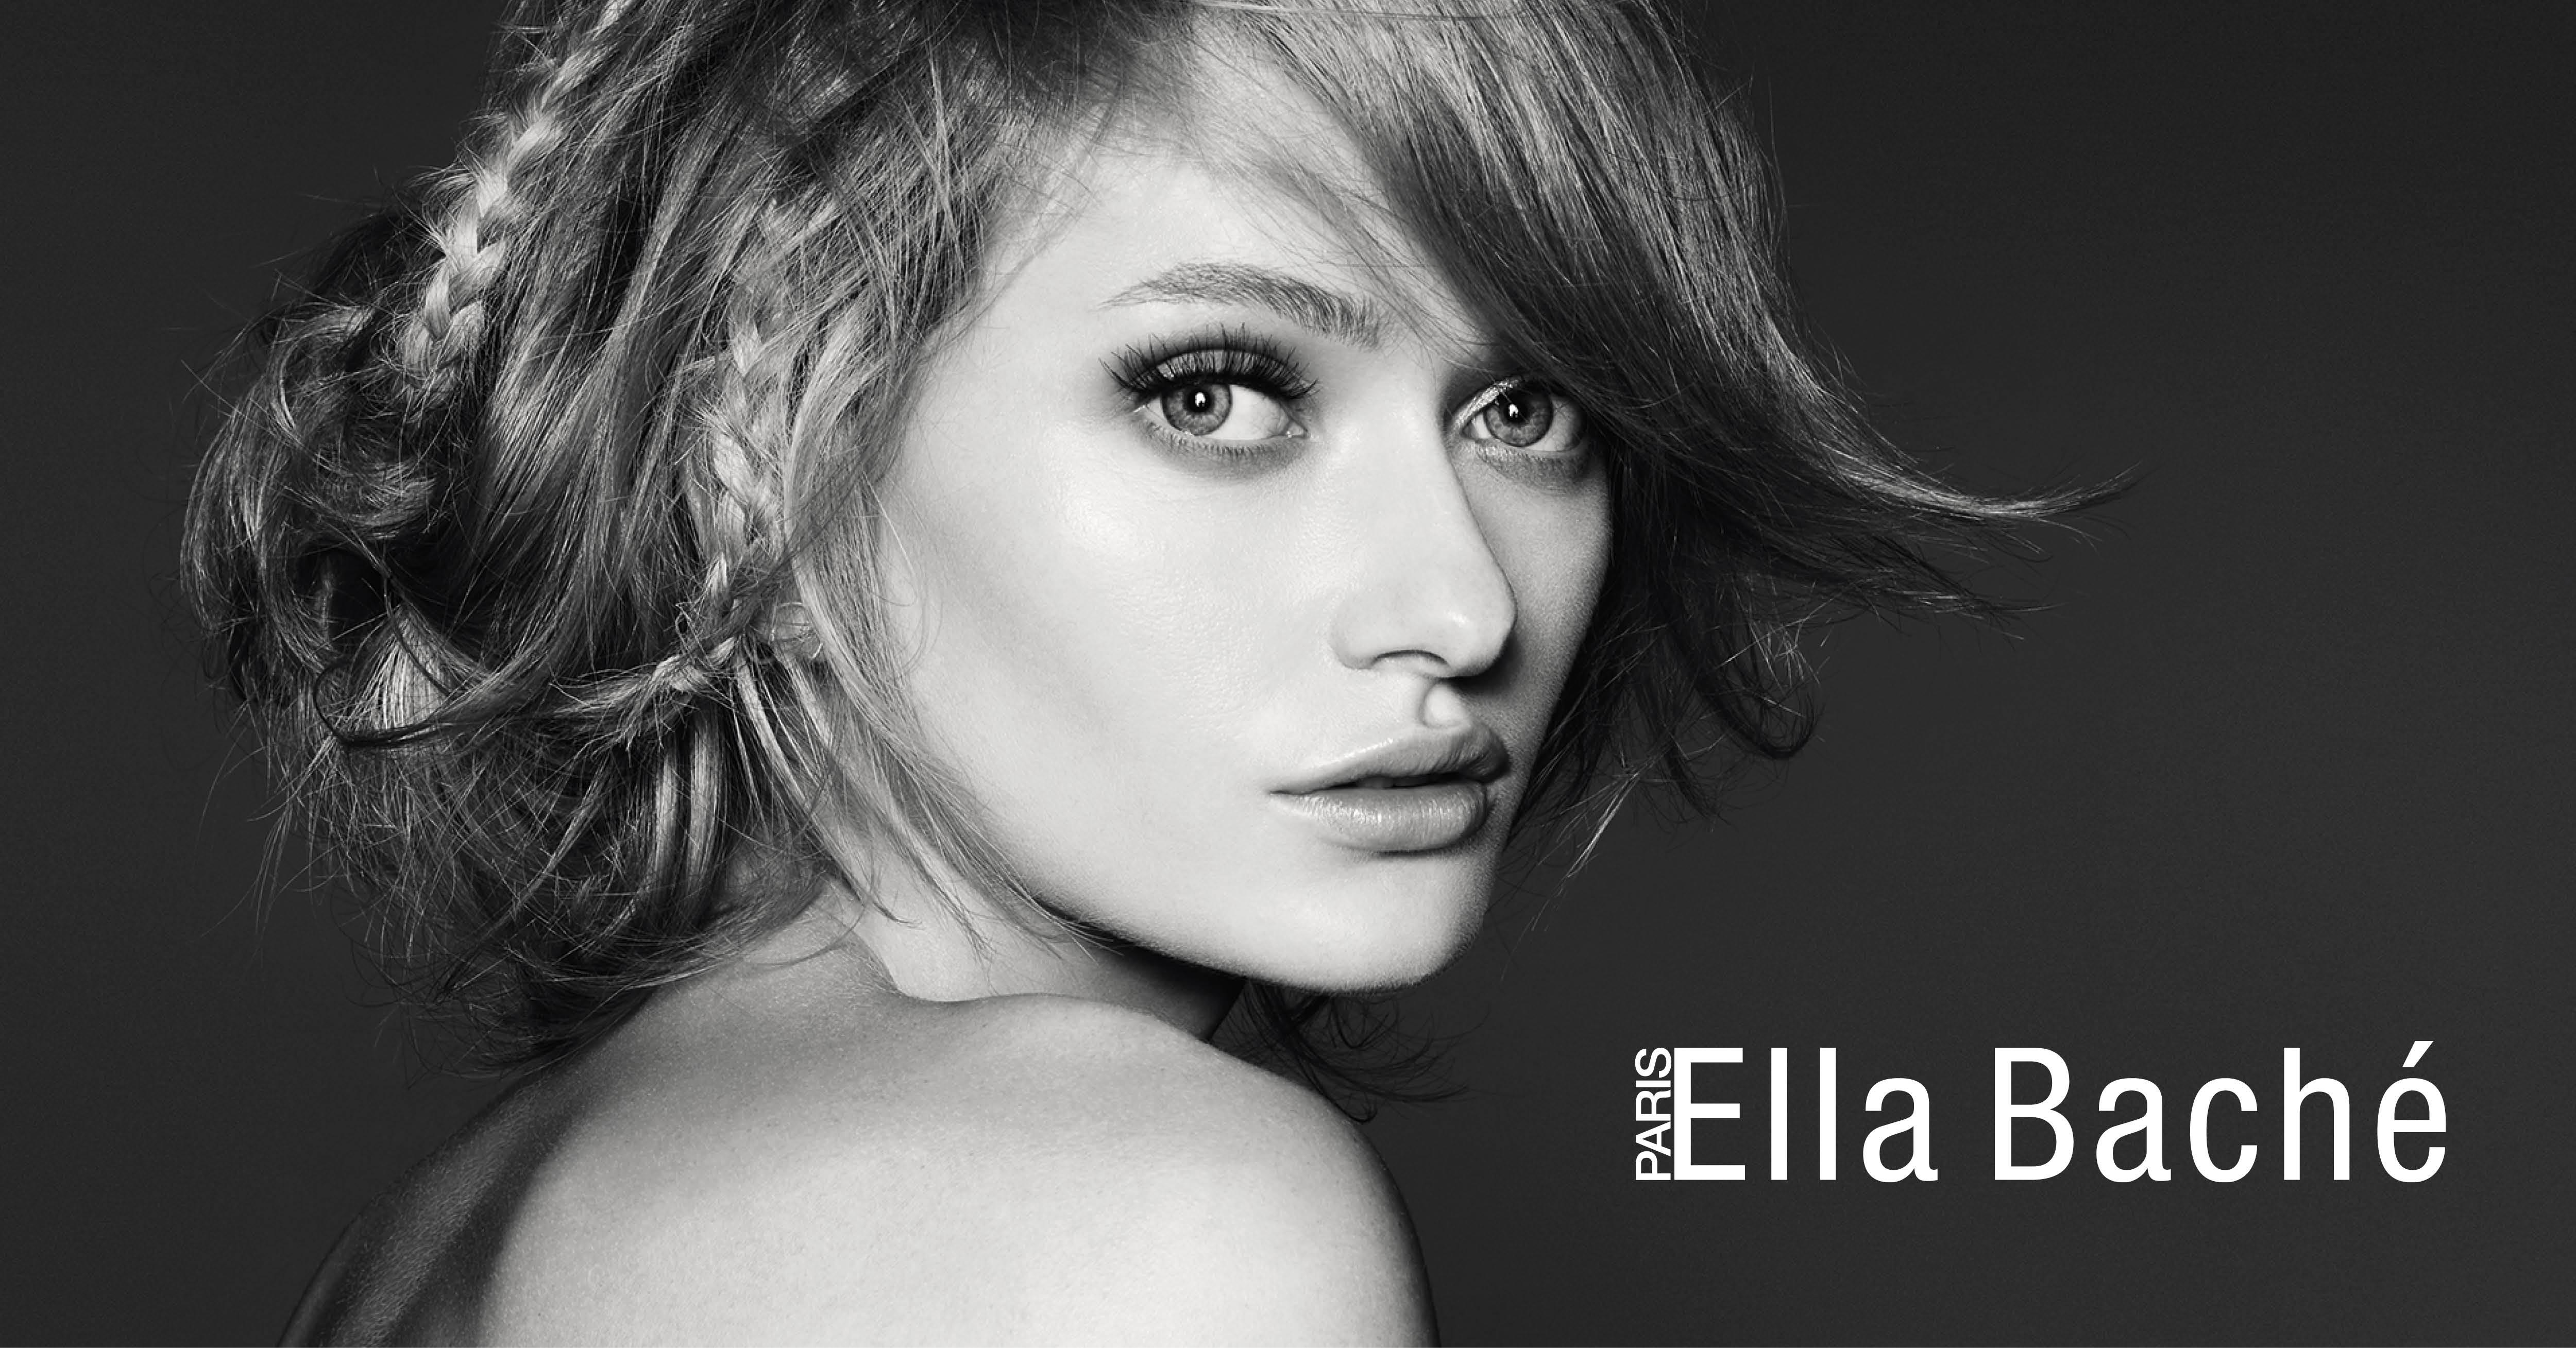 ella-bache-beauty-salon-new-franchise-opportunity-nsw-1